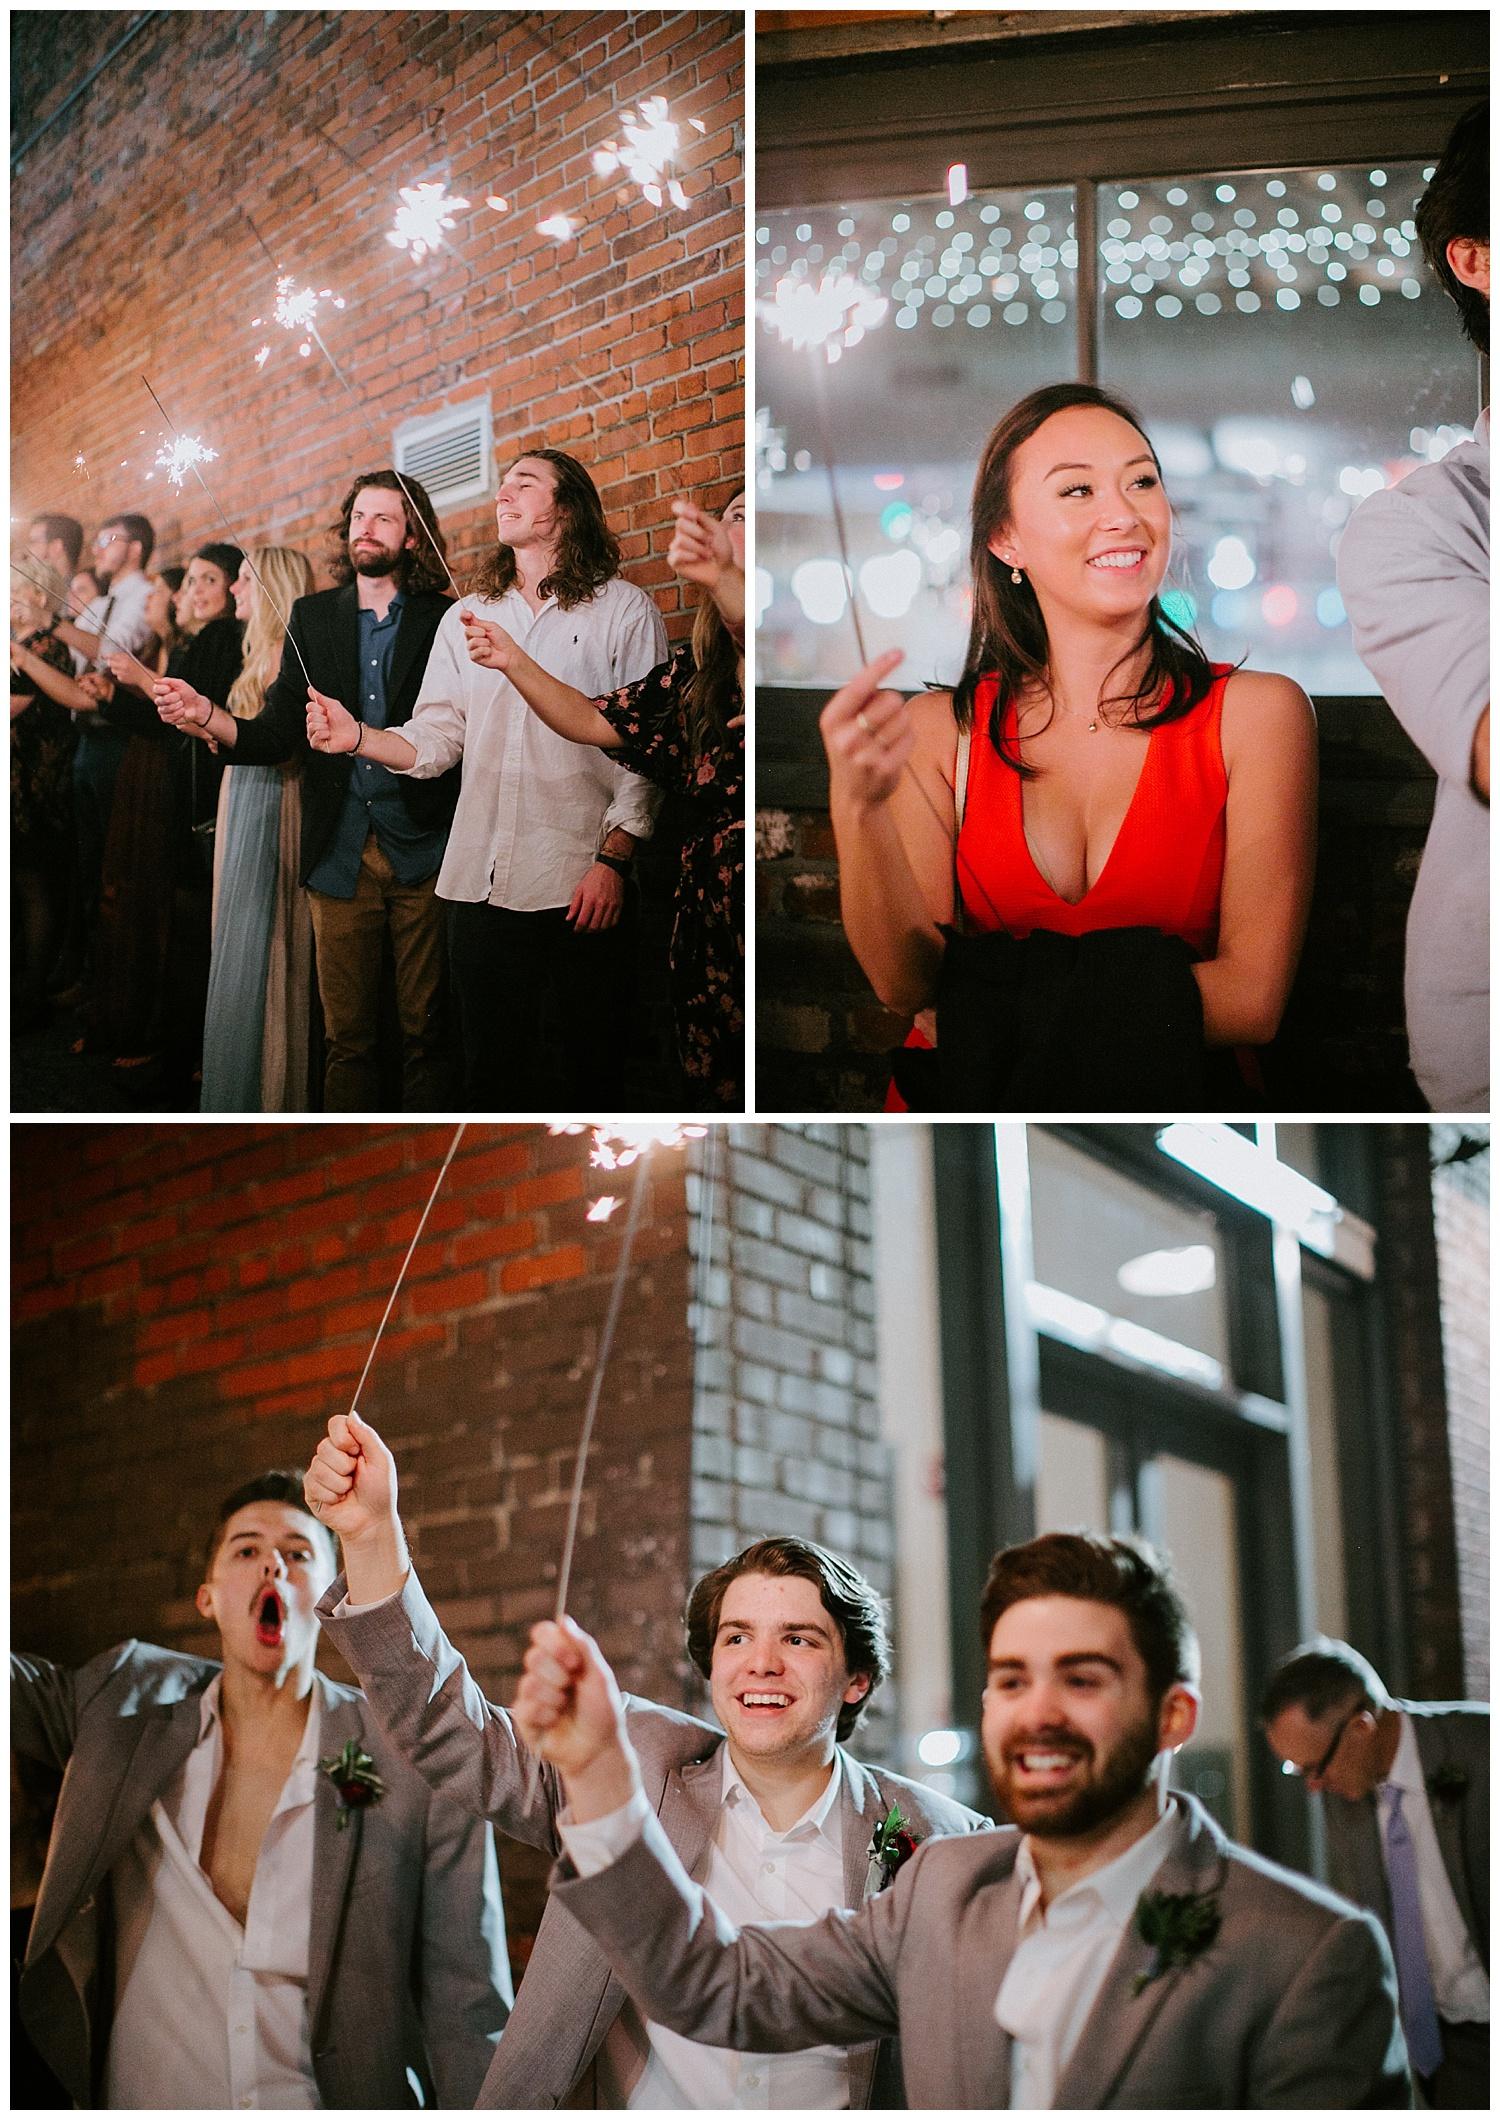 winter-wedding-the standard-knoxville_2019-01-23_0102.jpg